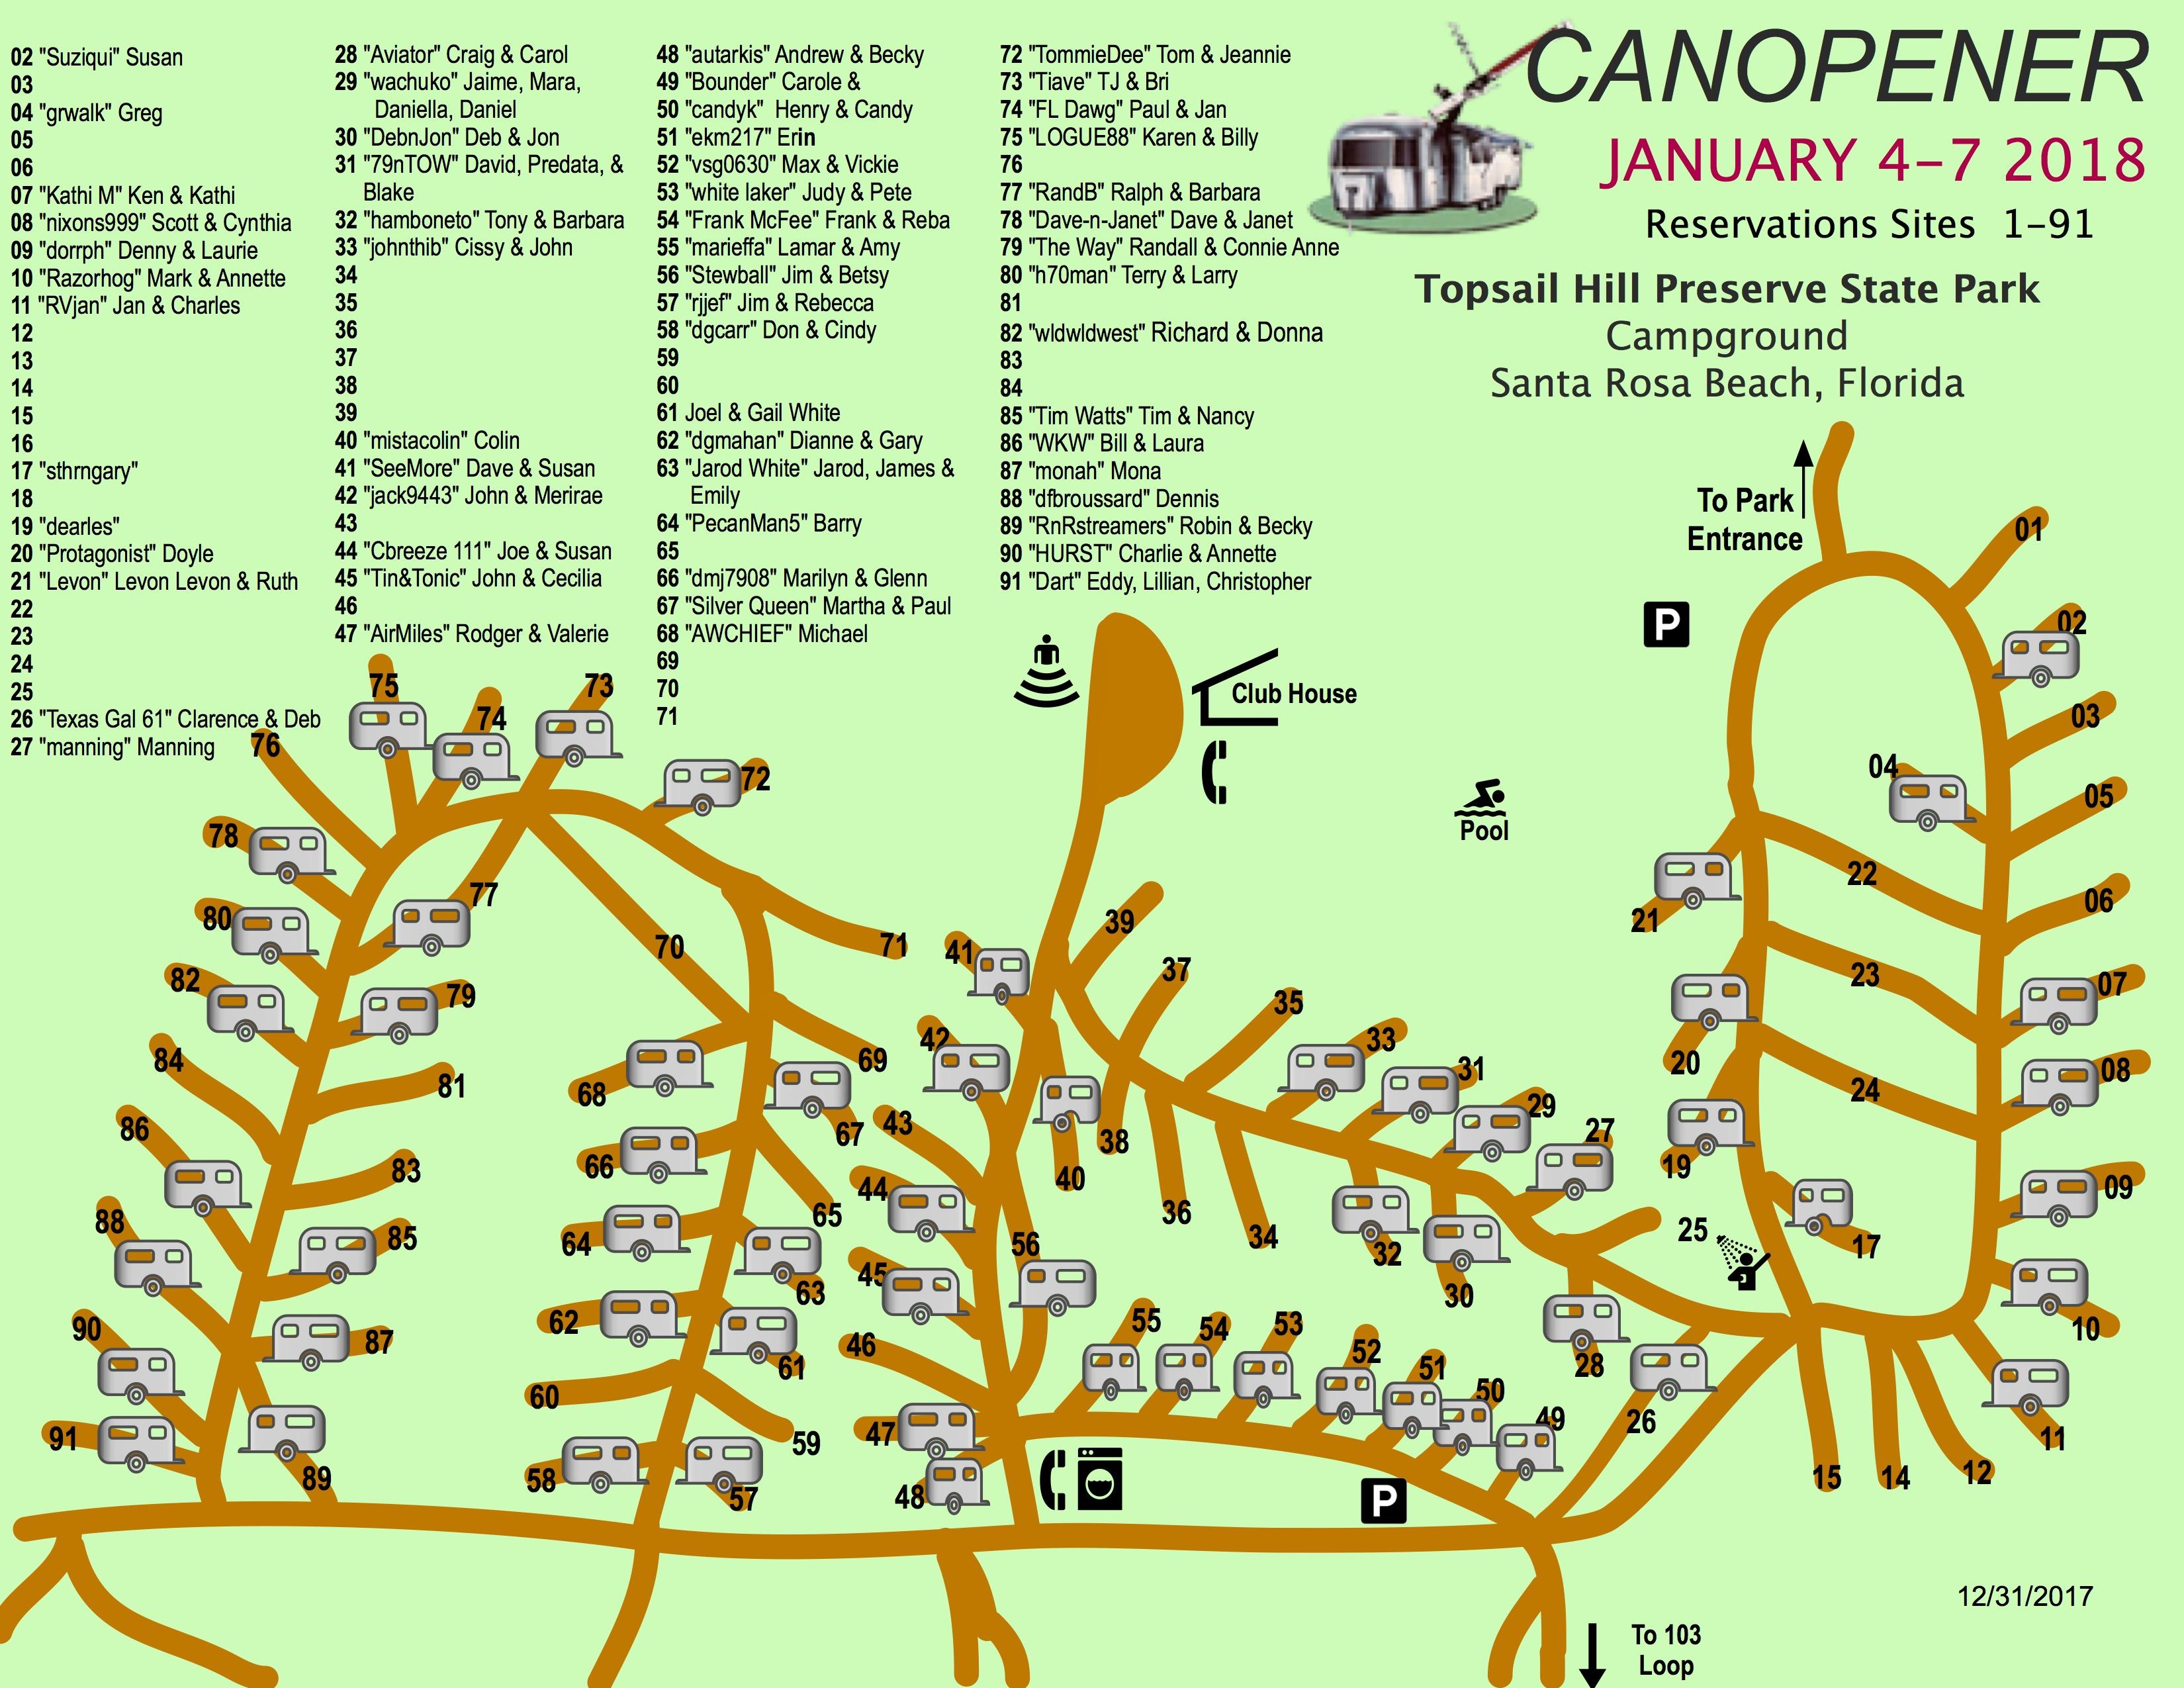 Canopener 2018 Map Sites 1-99